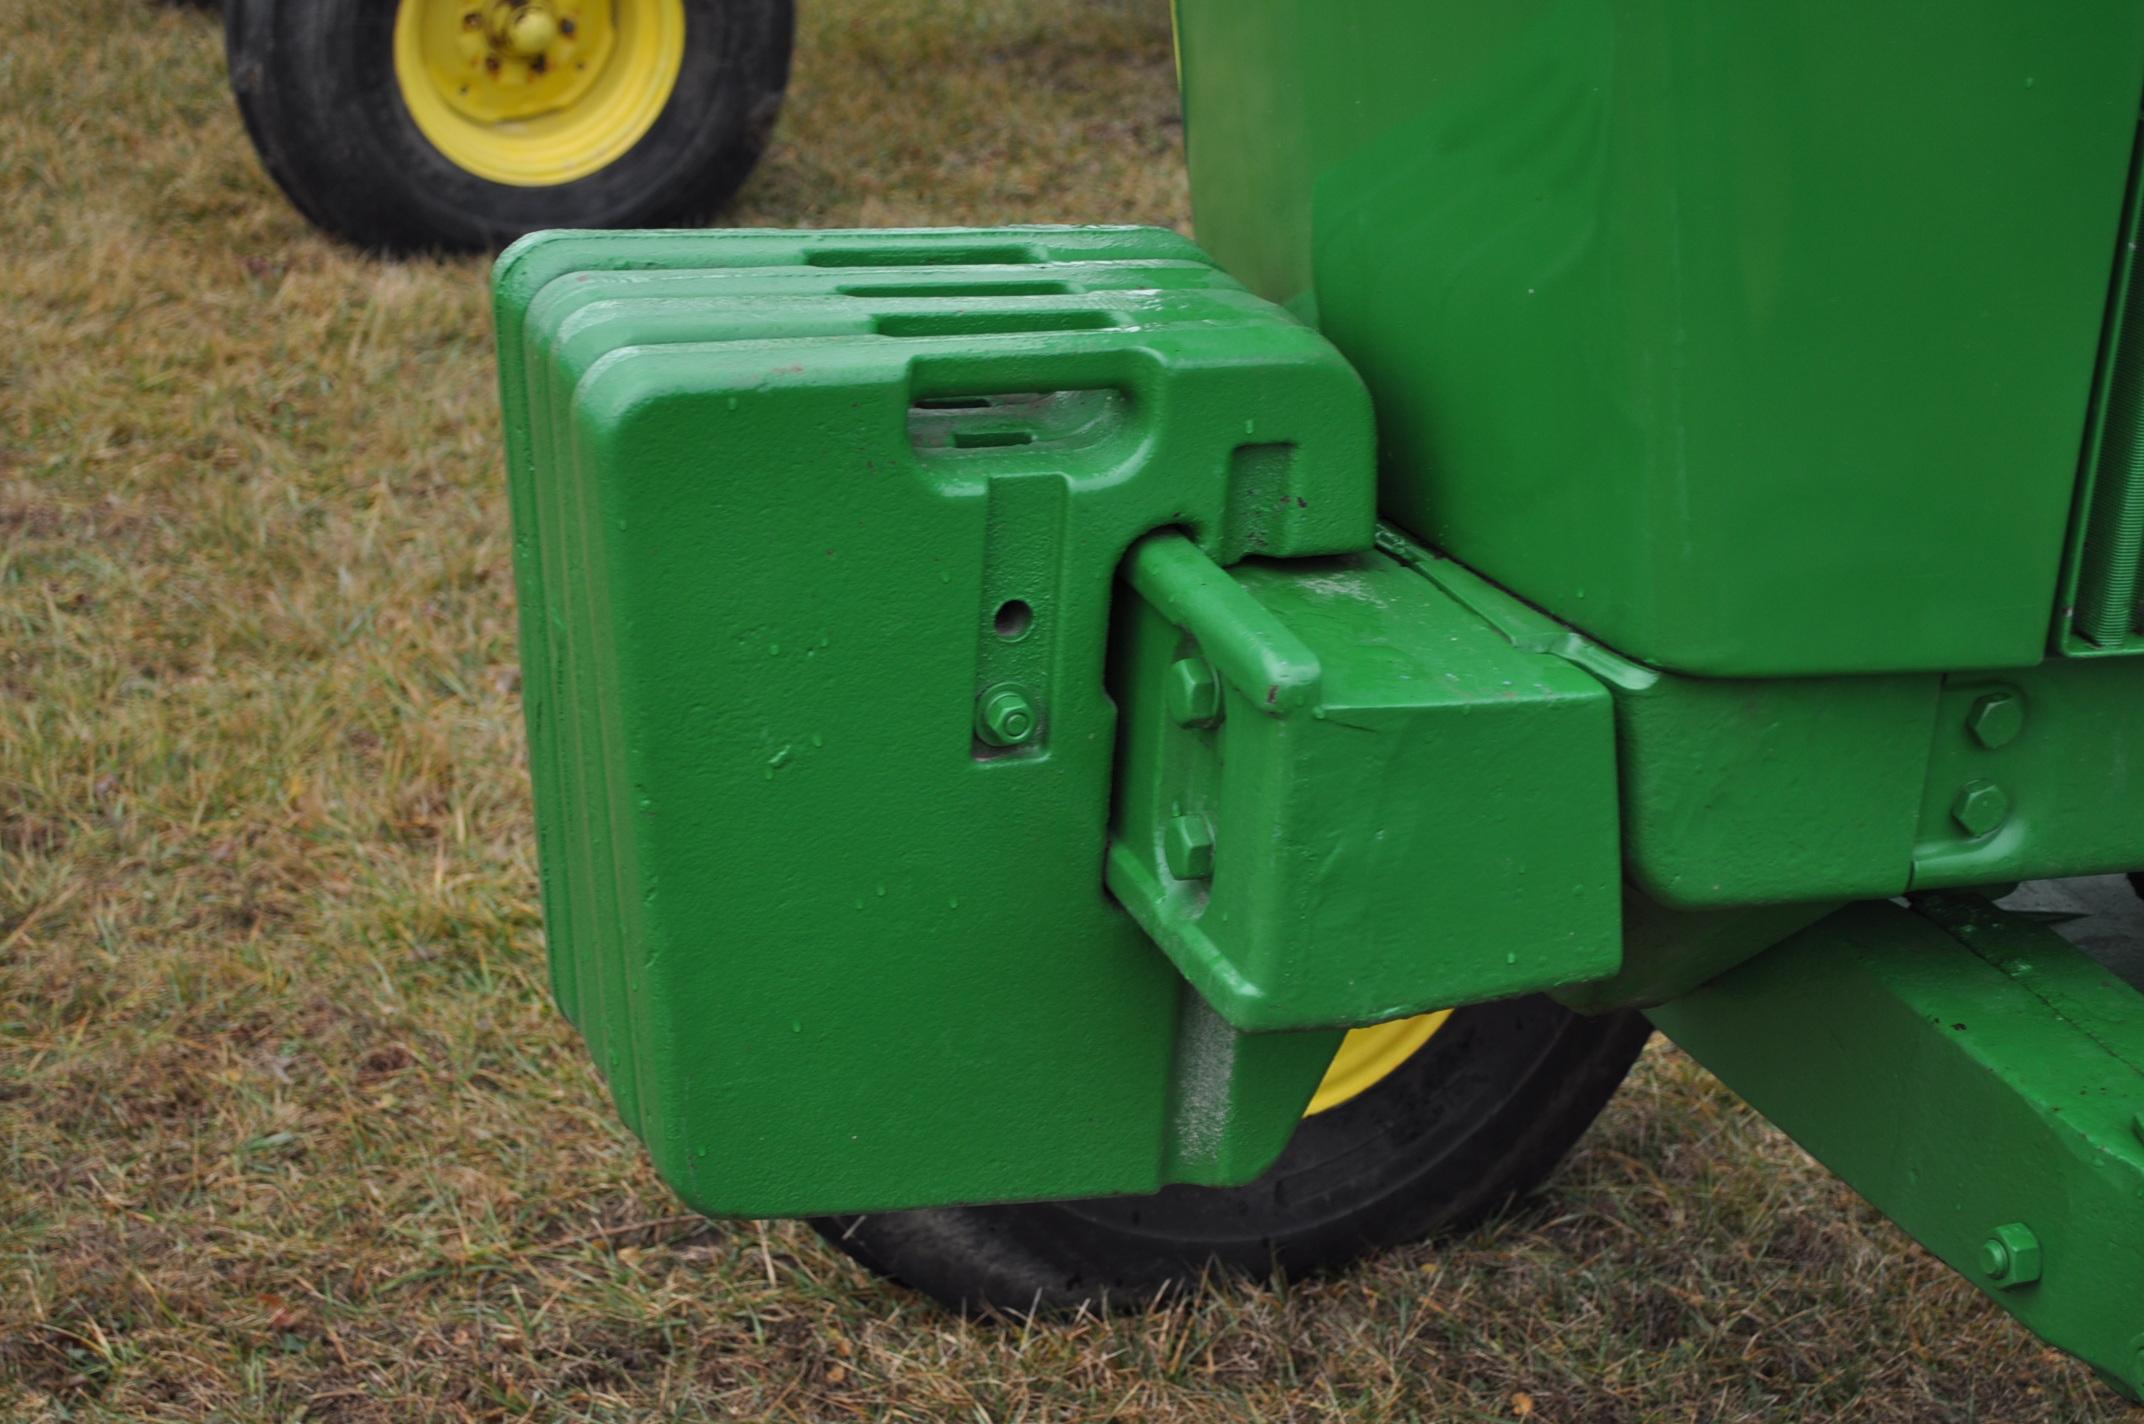 John Deere 4230 tractor, diesel, 18.4-34 hub duals, 10.00-16 front, CHA, Quad range, 2 hyd - Image 11 of 23